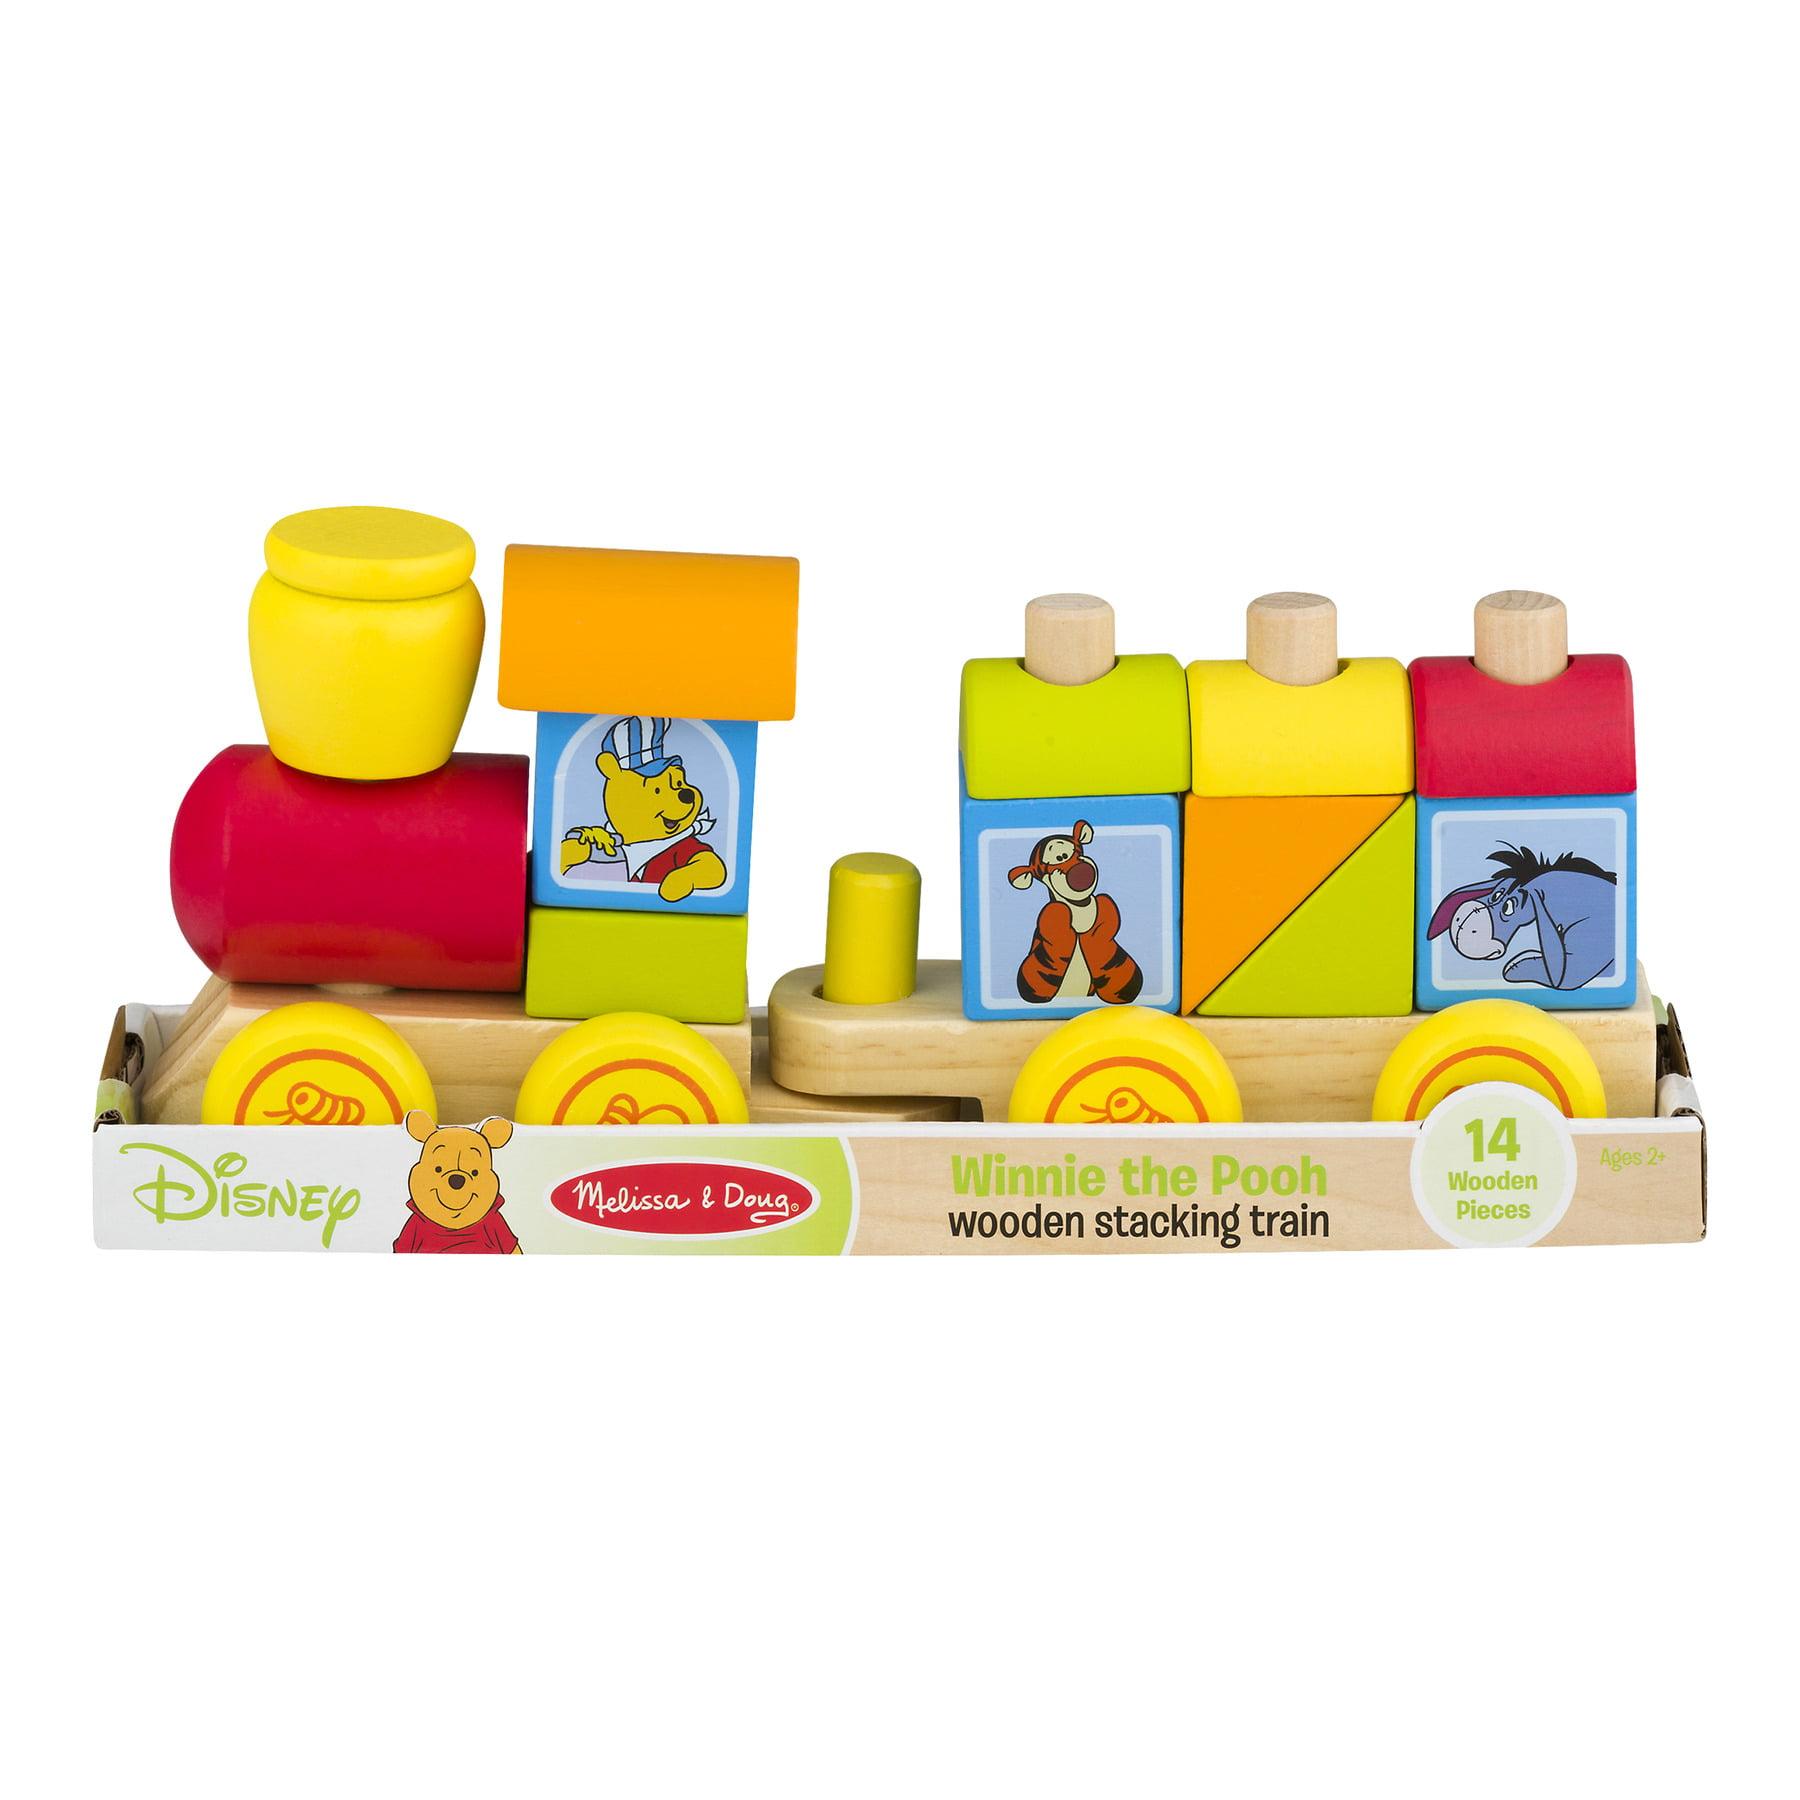 Disney Winnie The Pooh Wooden Stacking Train, 14.0 PIECE(S) by Melissa & Doug LLC